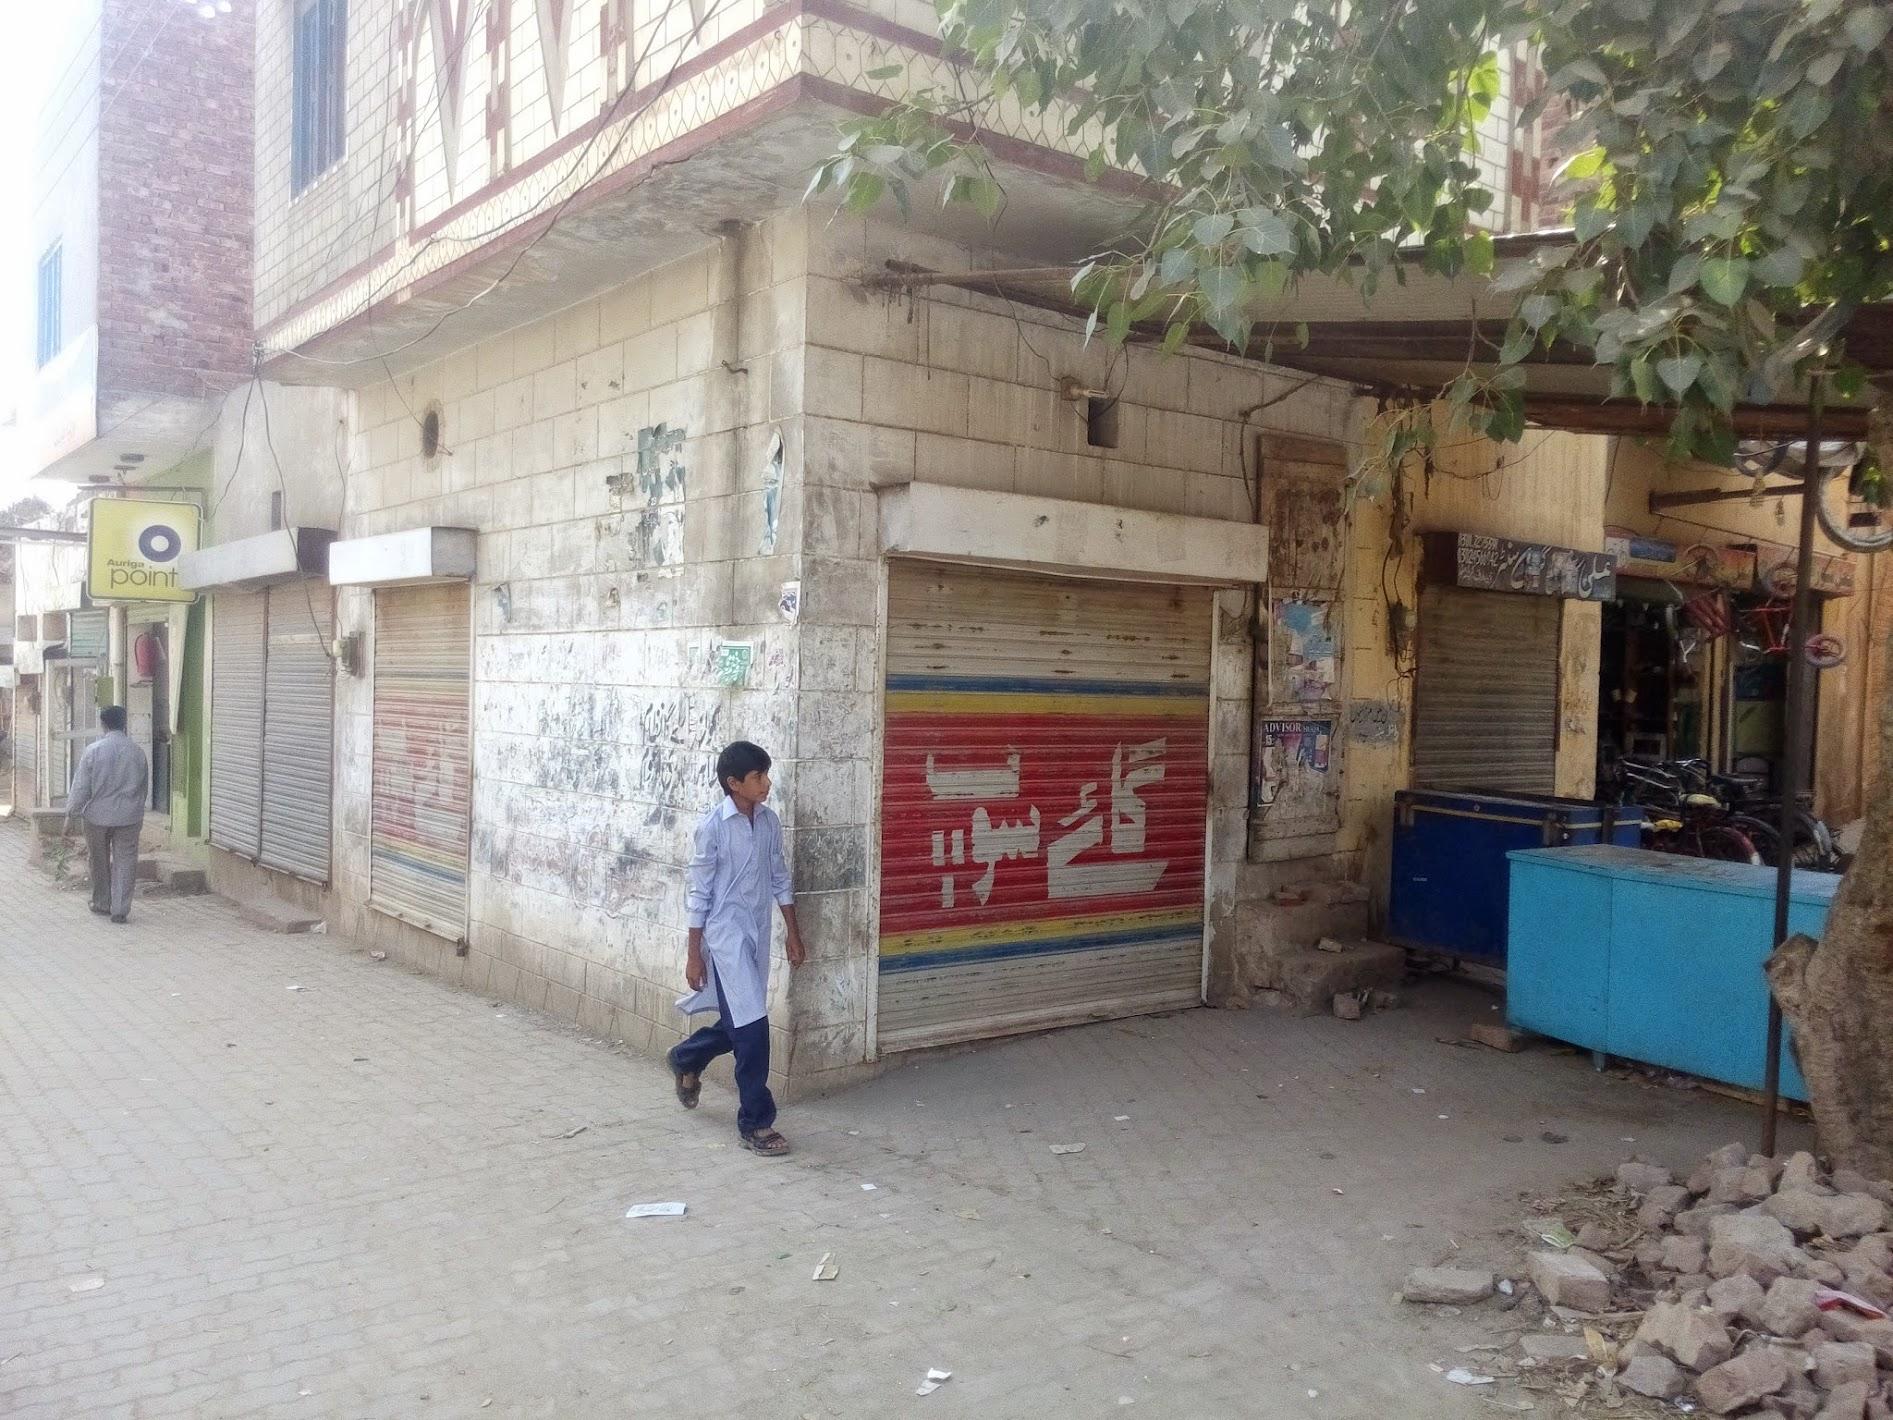 Village bazaar : Ghanta Ghar Chowk